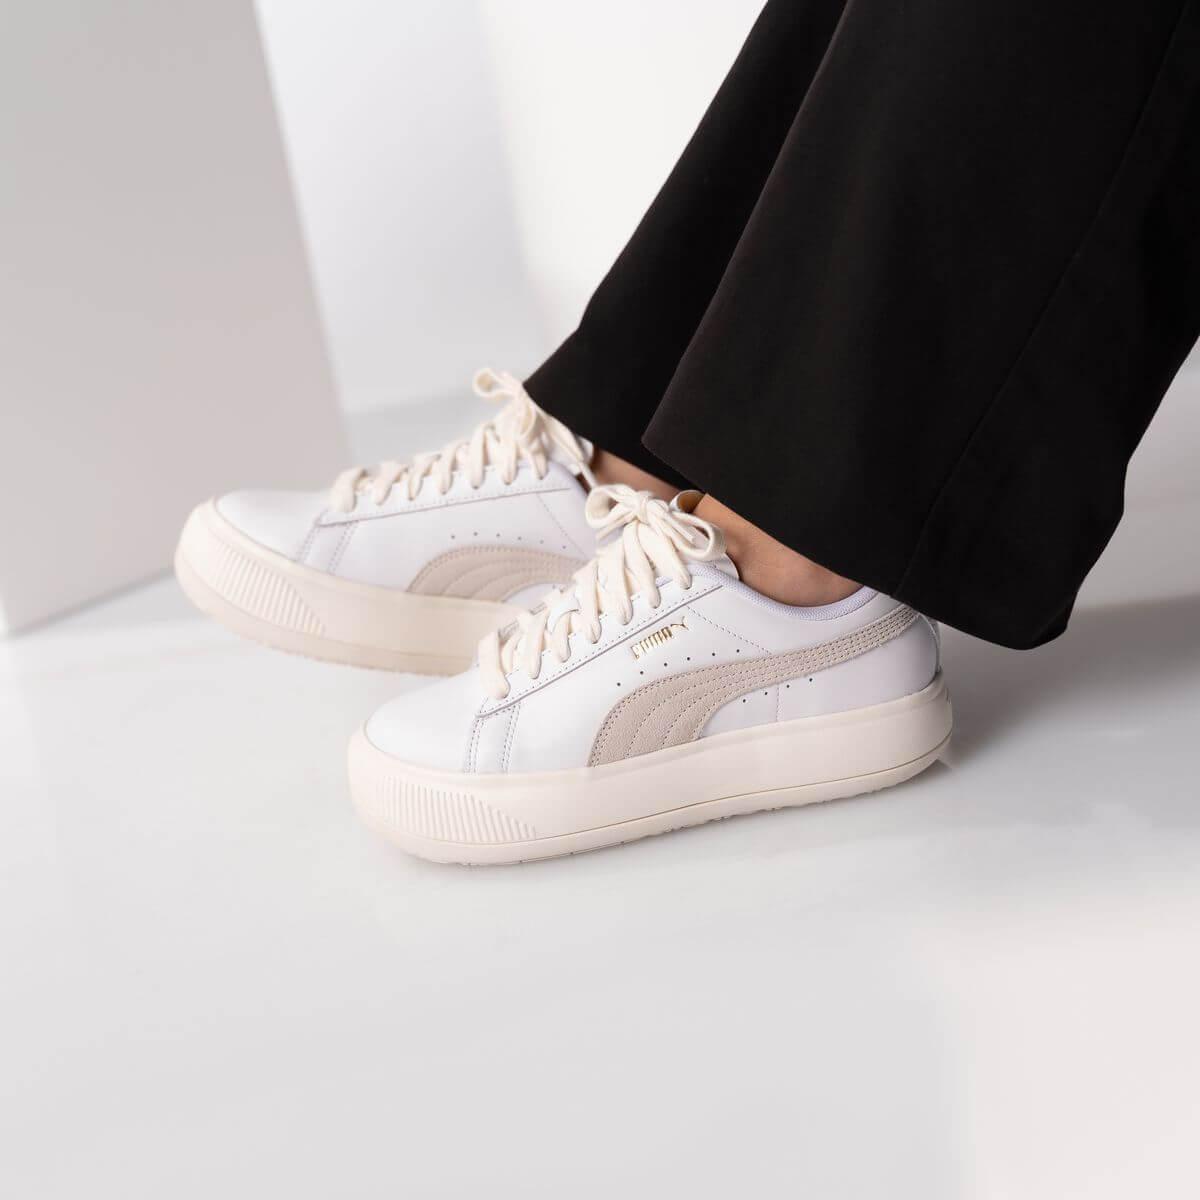 PUMA- Suede Mayu - white/marshmallow - 381042 01